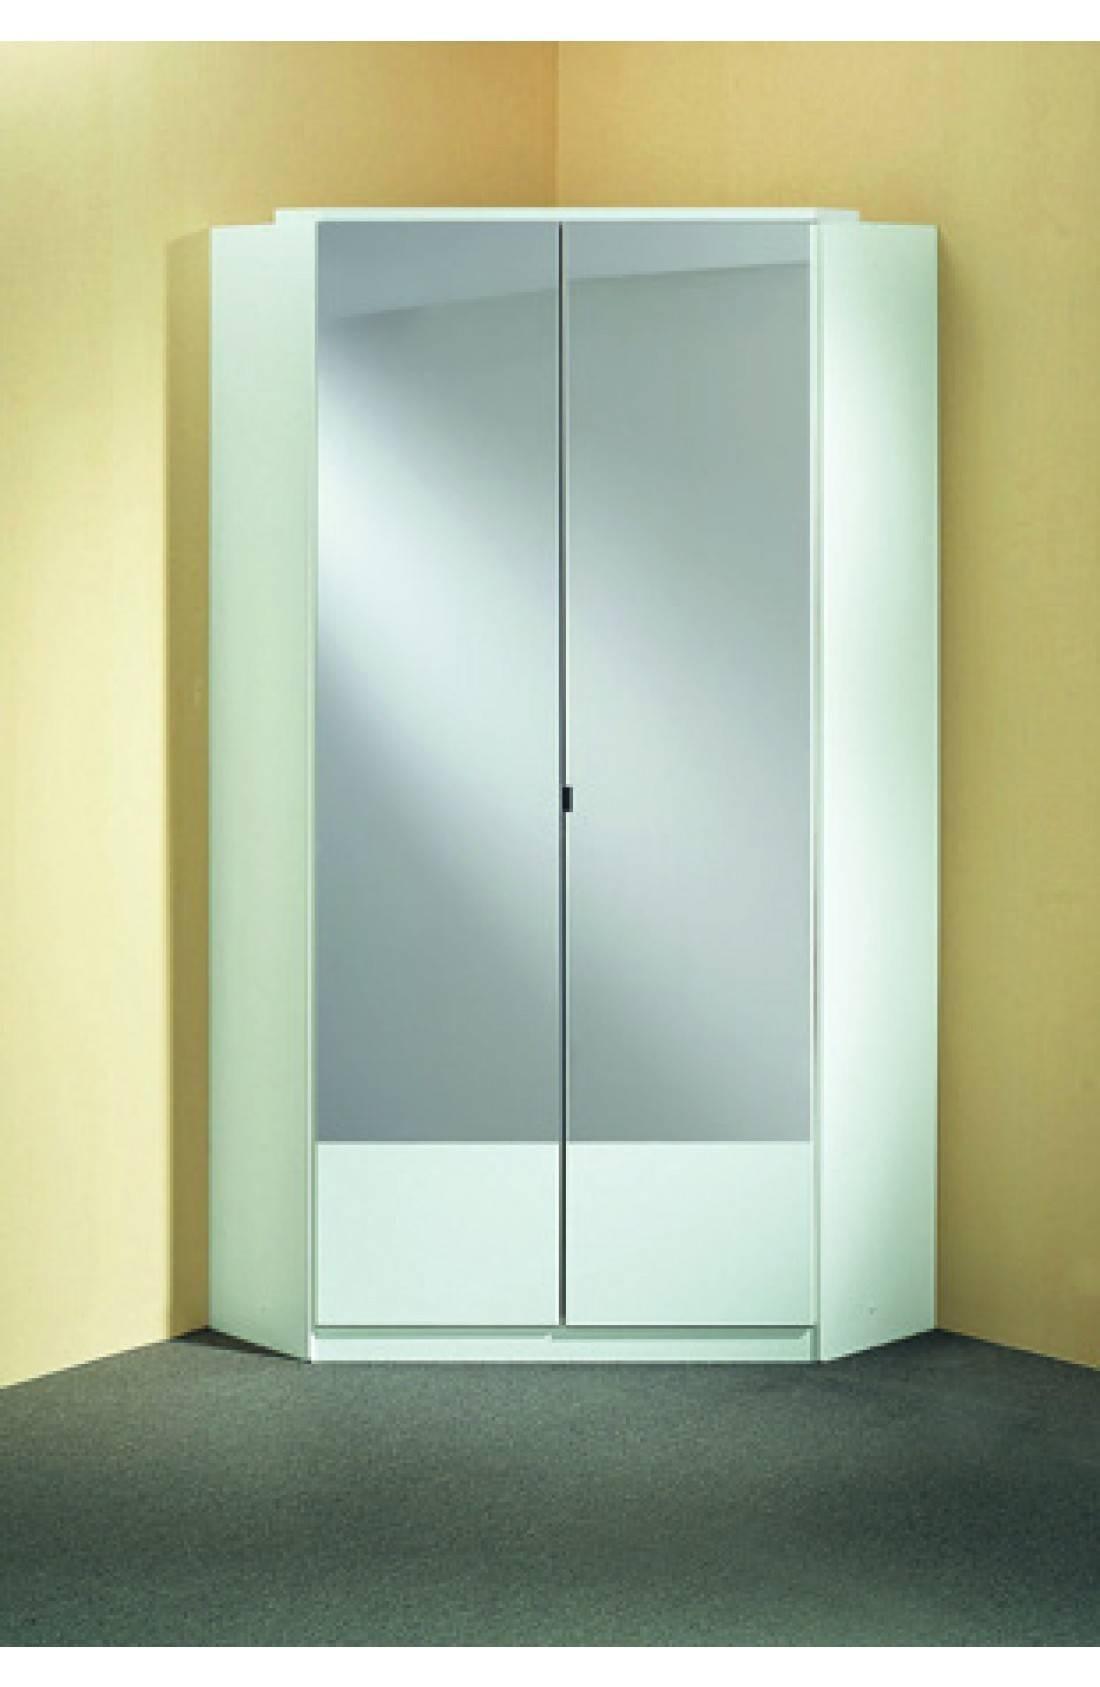 Slumberhaus 'imago' German Made Modern Alpine White & Mirror 2 Inside 1 Door Corner Wardrobes (View 14 of 15)